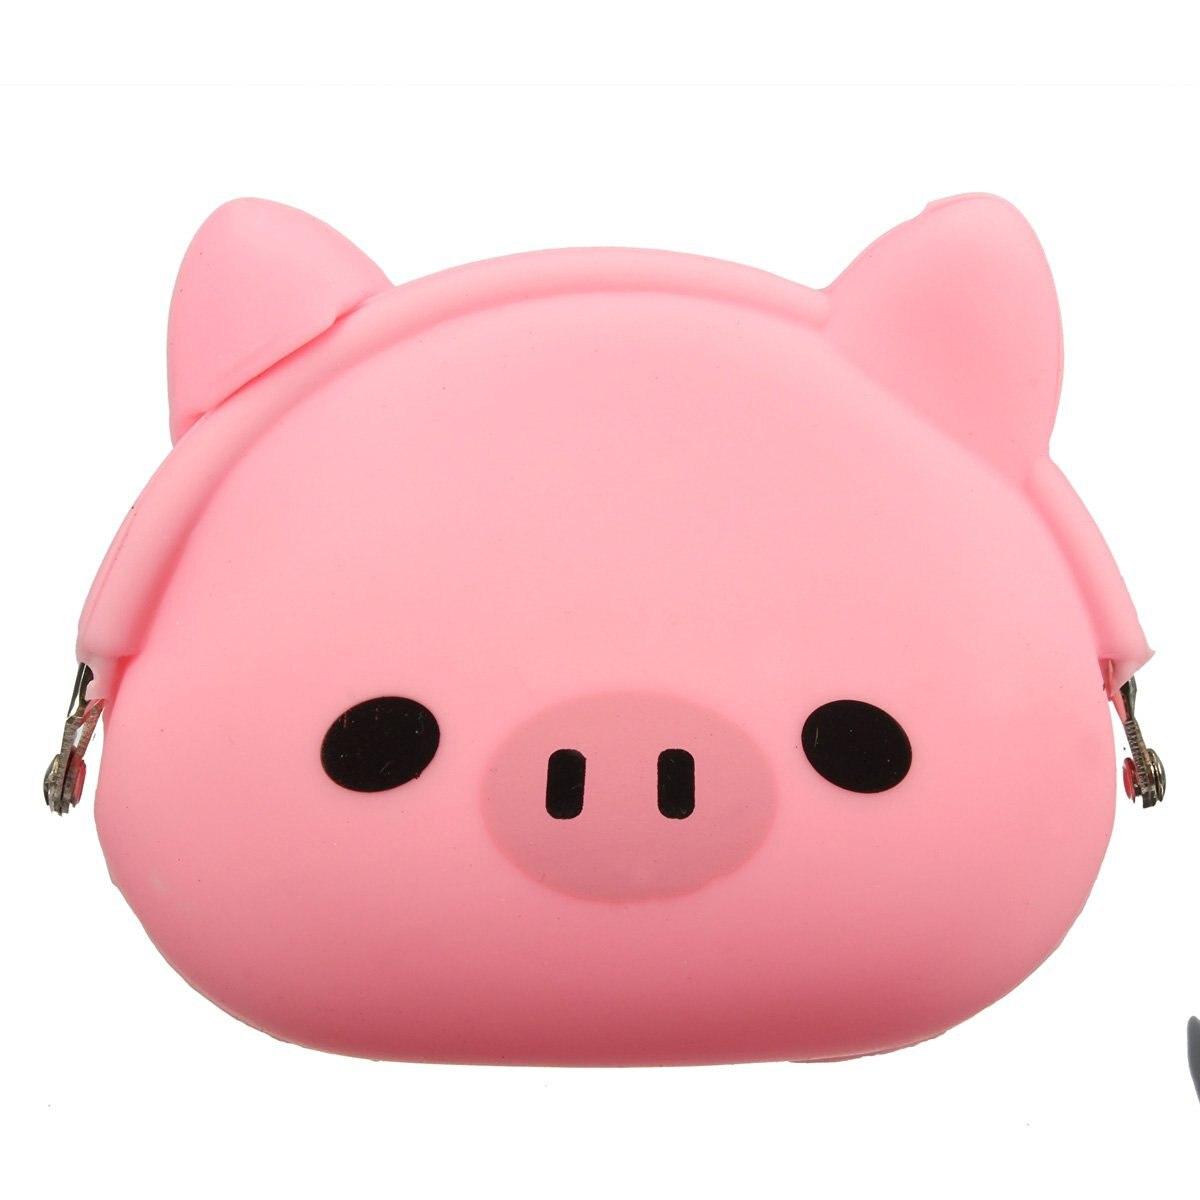 Gentle Cute Cartoon Animal Coin Purses Kawaii Animal Mini Change Wallet Small Bag Cute Kids Zipper Pouch Gift Luggage & Bags Coin Purses